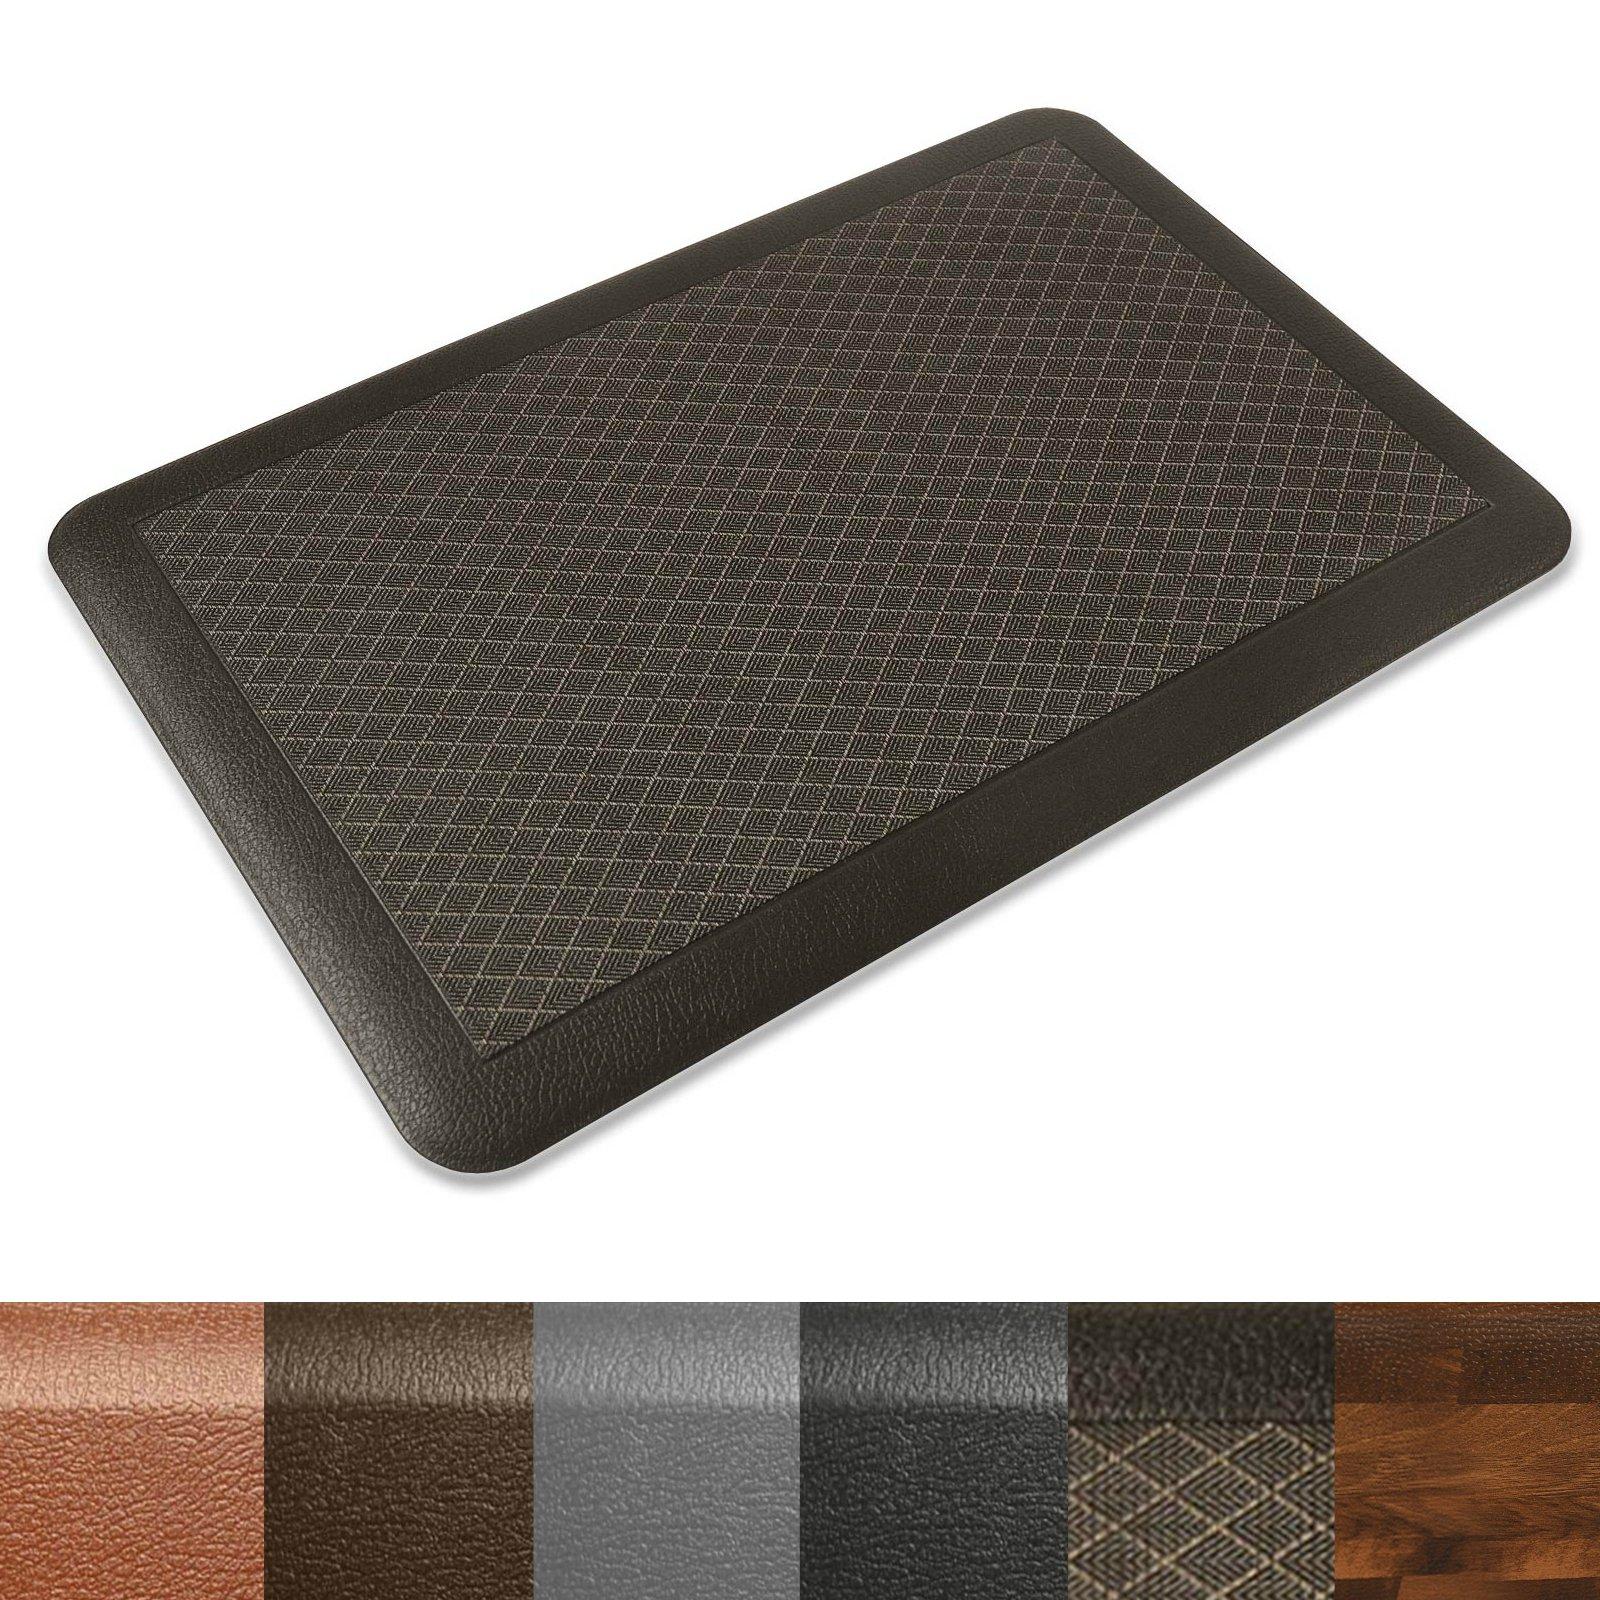 Kitchen Mat | Anti Fatigue Mat, 3/4 Thick | Ergonomically Engineered, Non-Slip, Waterproof | 20''x30'' - Dark Brown by casa pura